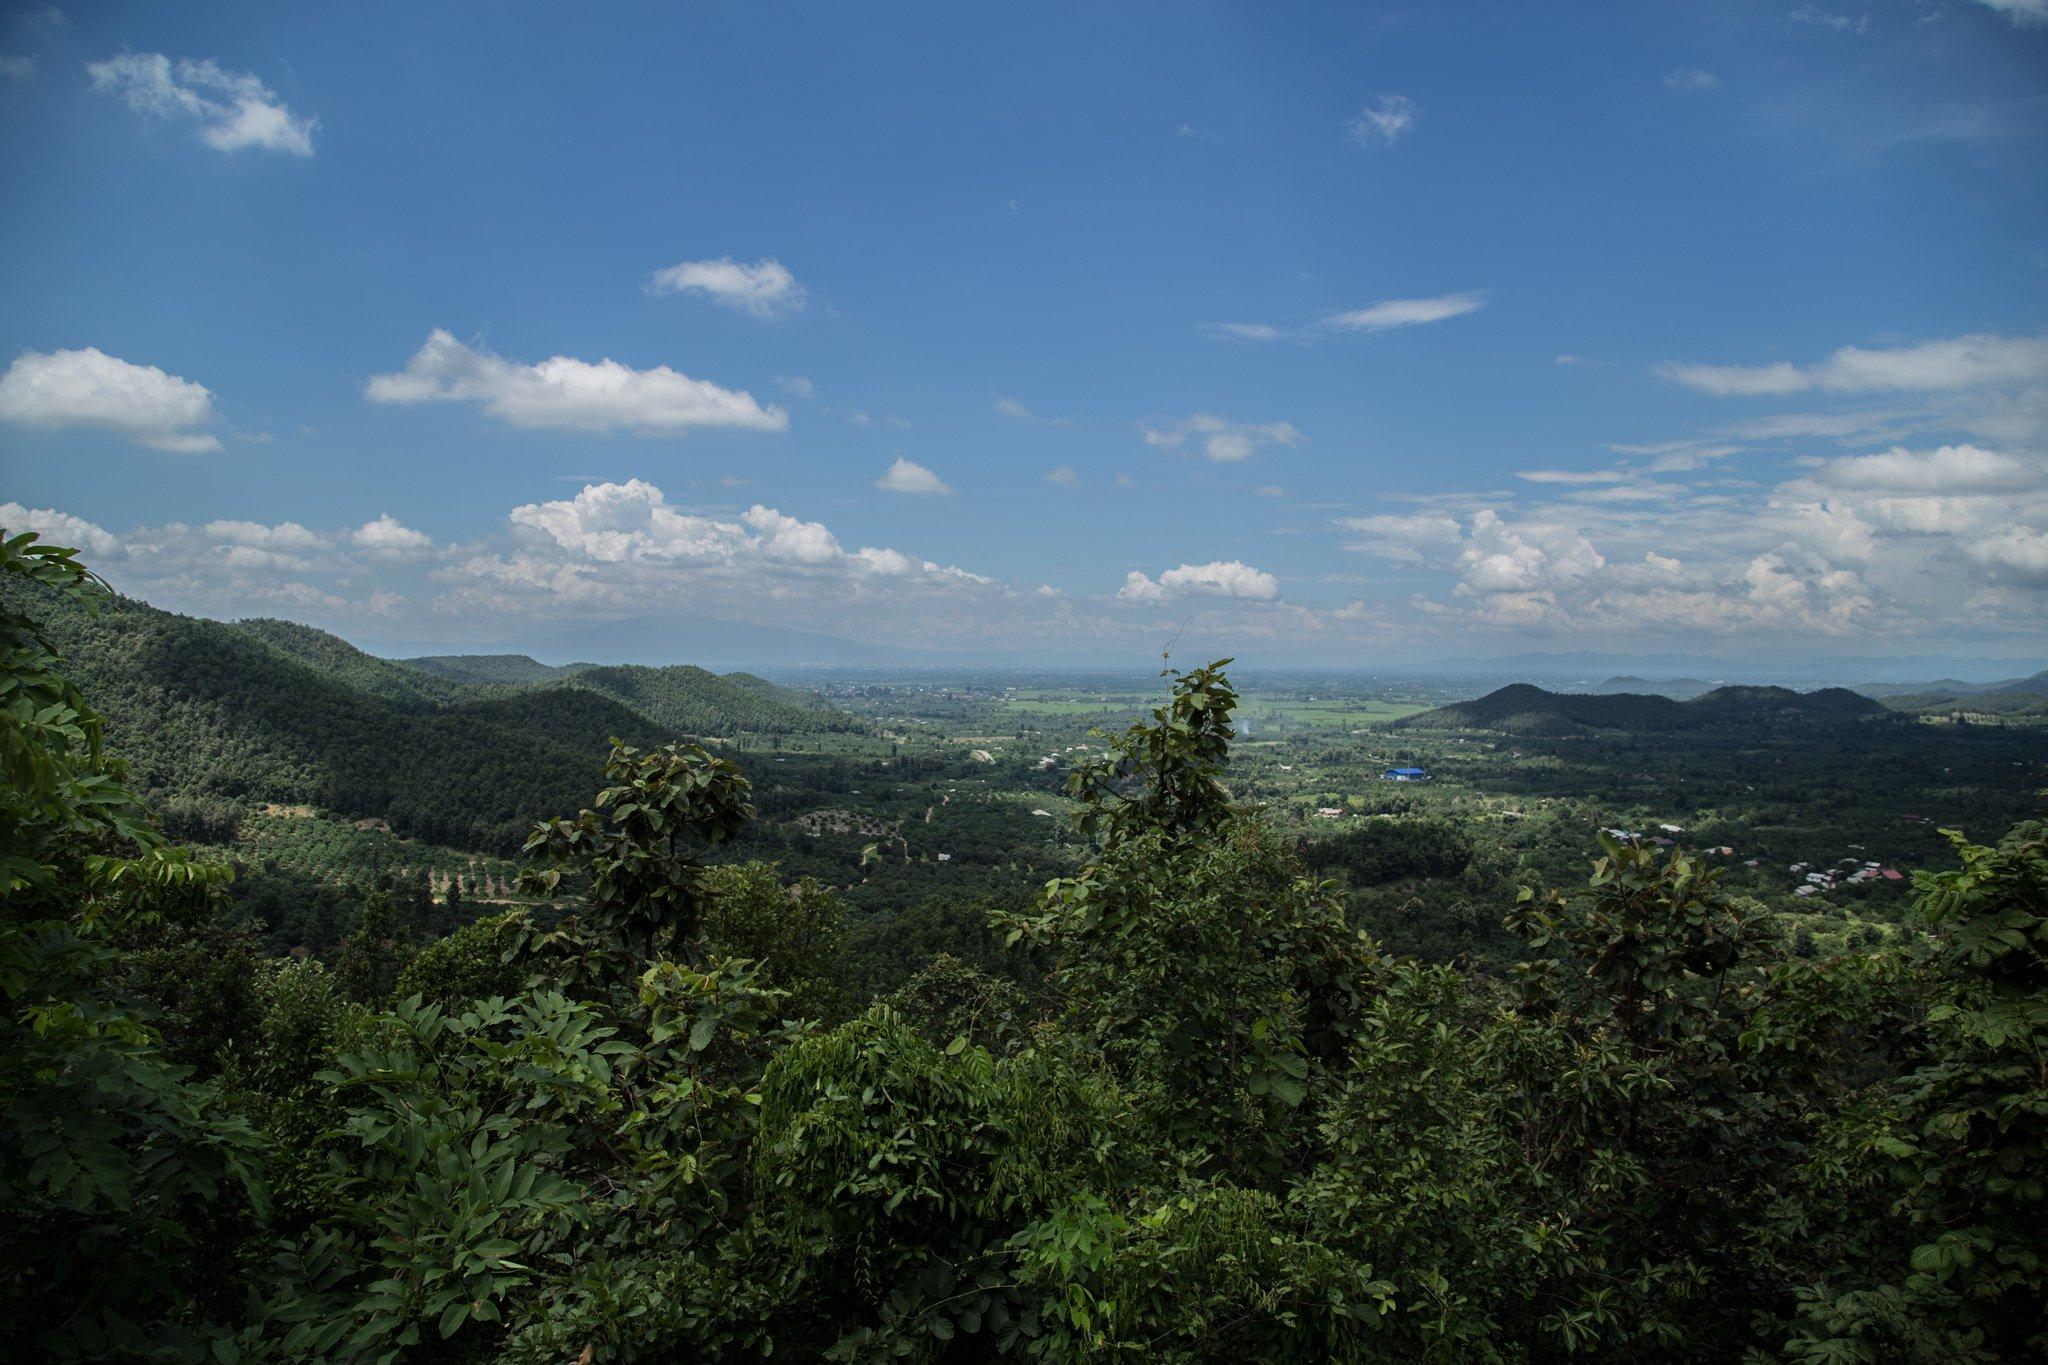 Doi Suthep on the opposite side of the valley